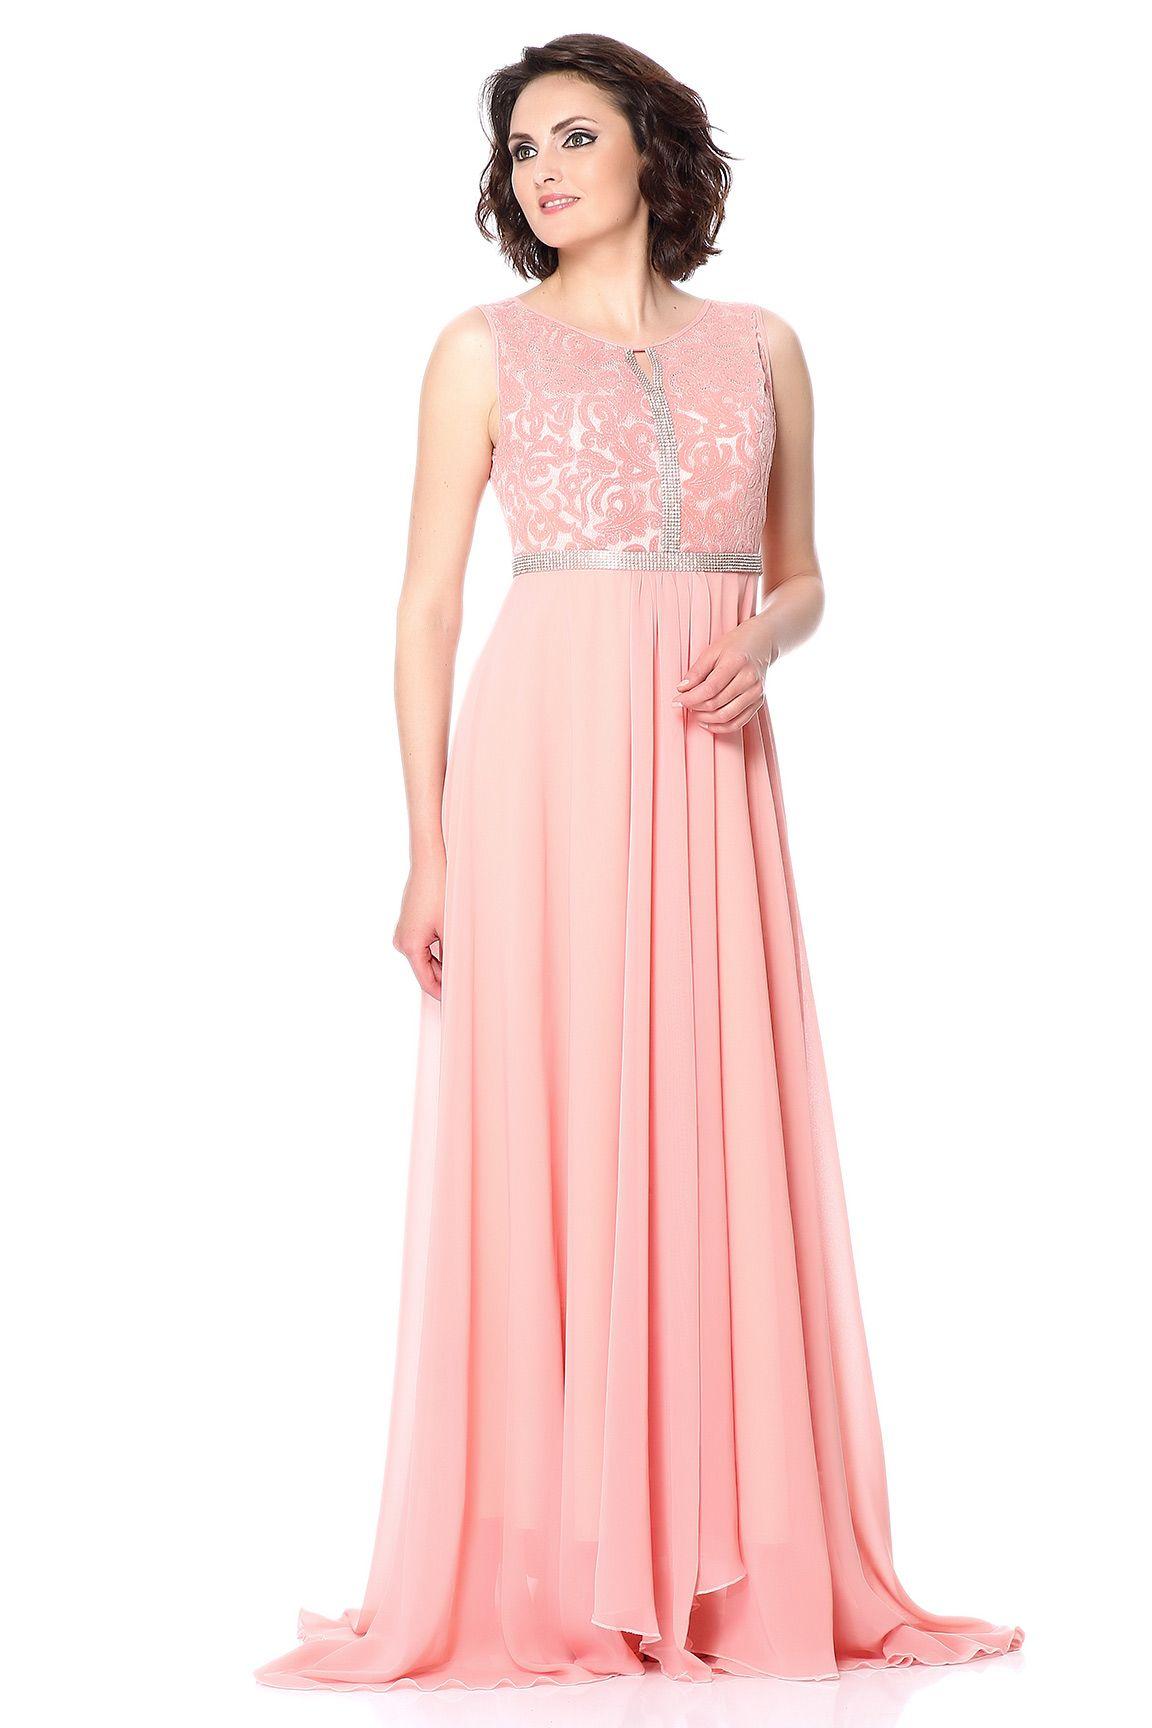 Pictures gece elbise modelleri 2013 uzun dekolteli gece elbise modeli - Somon Abiye Somon Rengi Uzun Abiye Elbise Abiye Elbise Modelleri